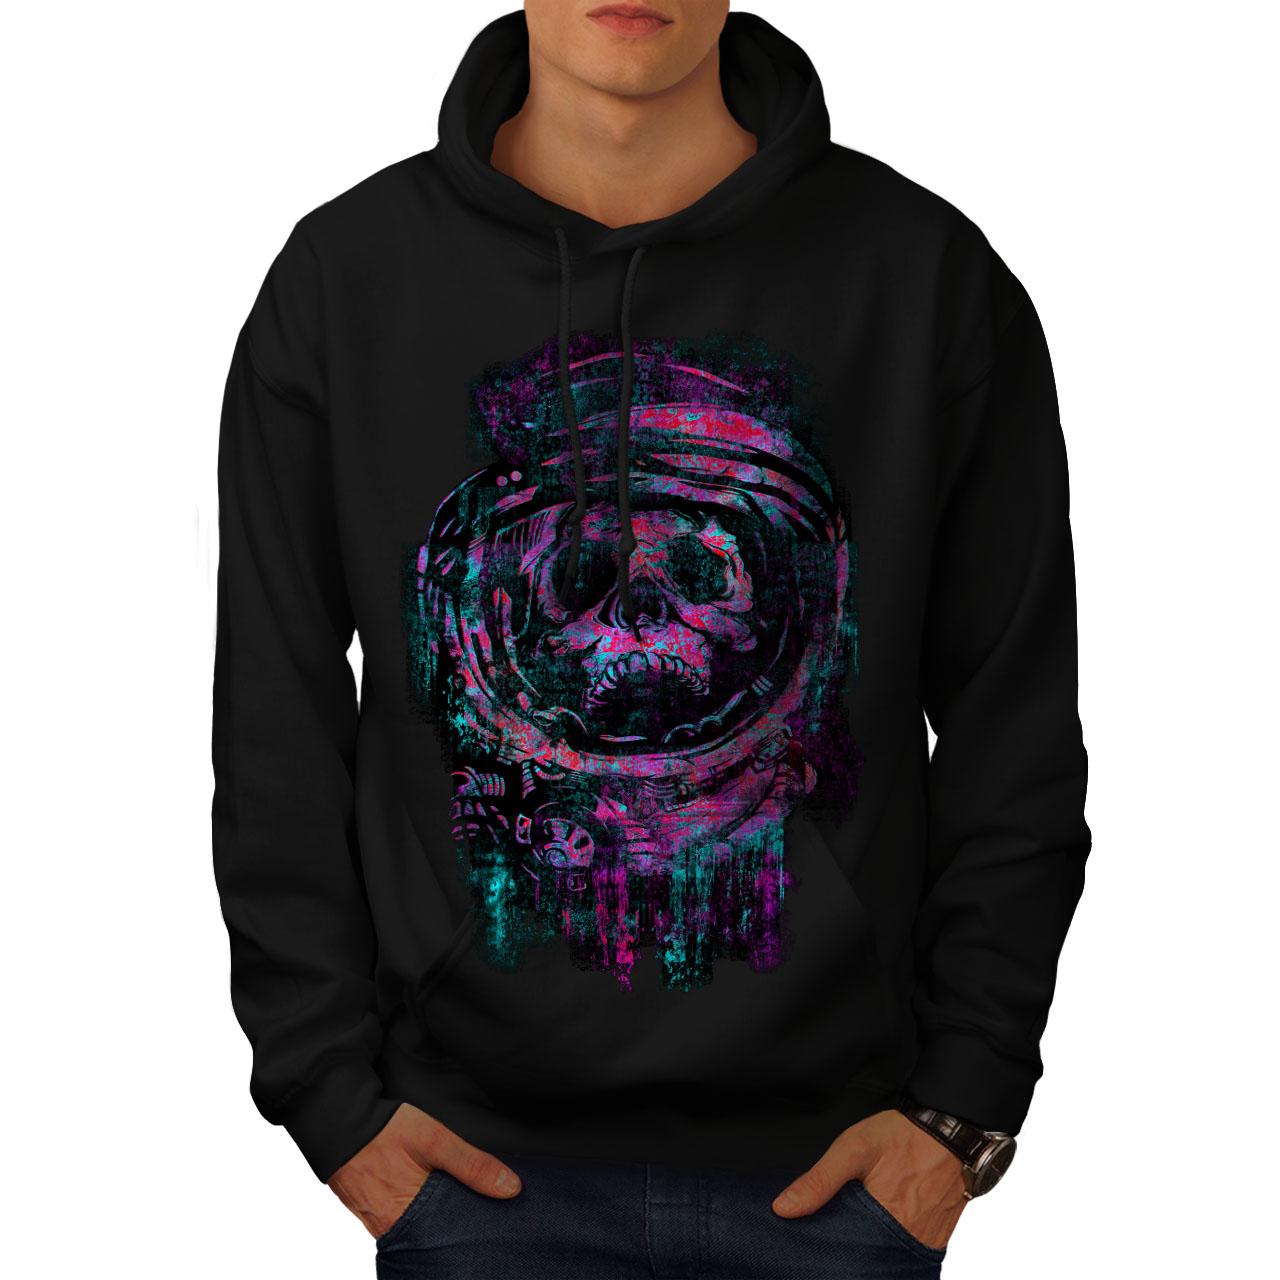 Purple Casual Jumper wellcoda Guy Mystic Being Mens Sweatshirt